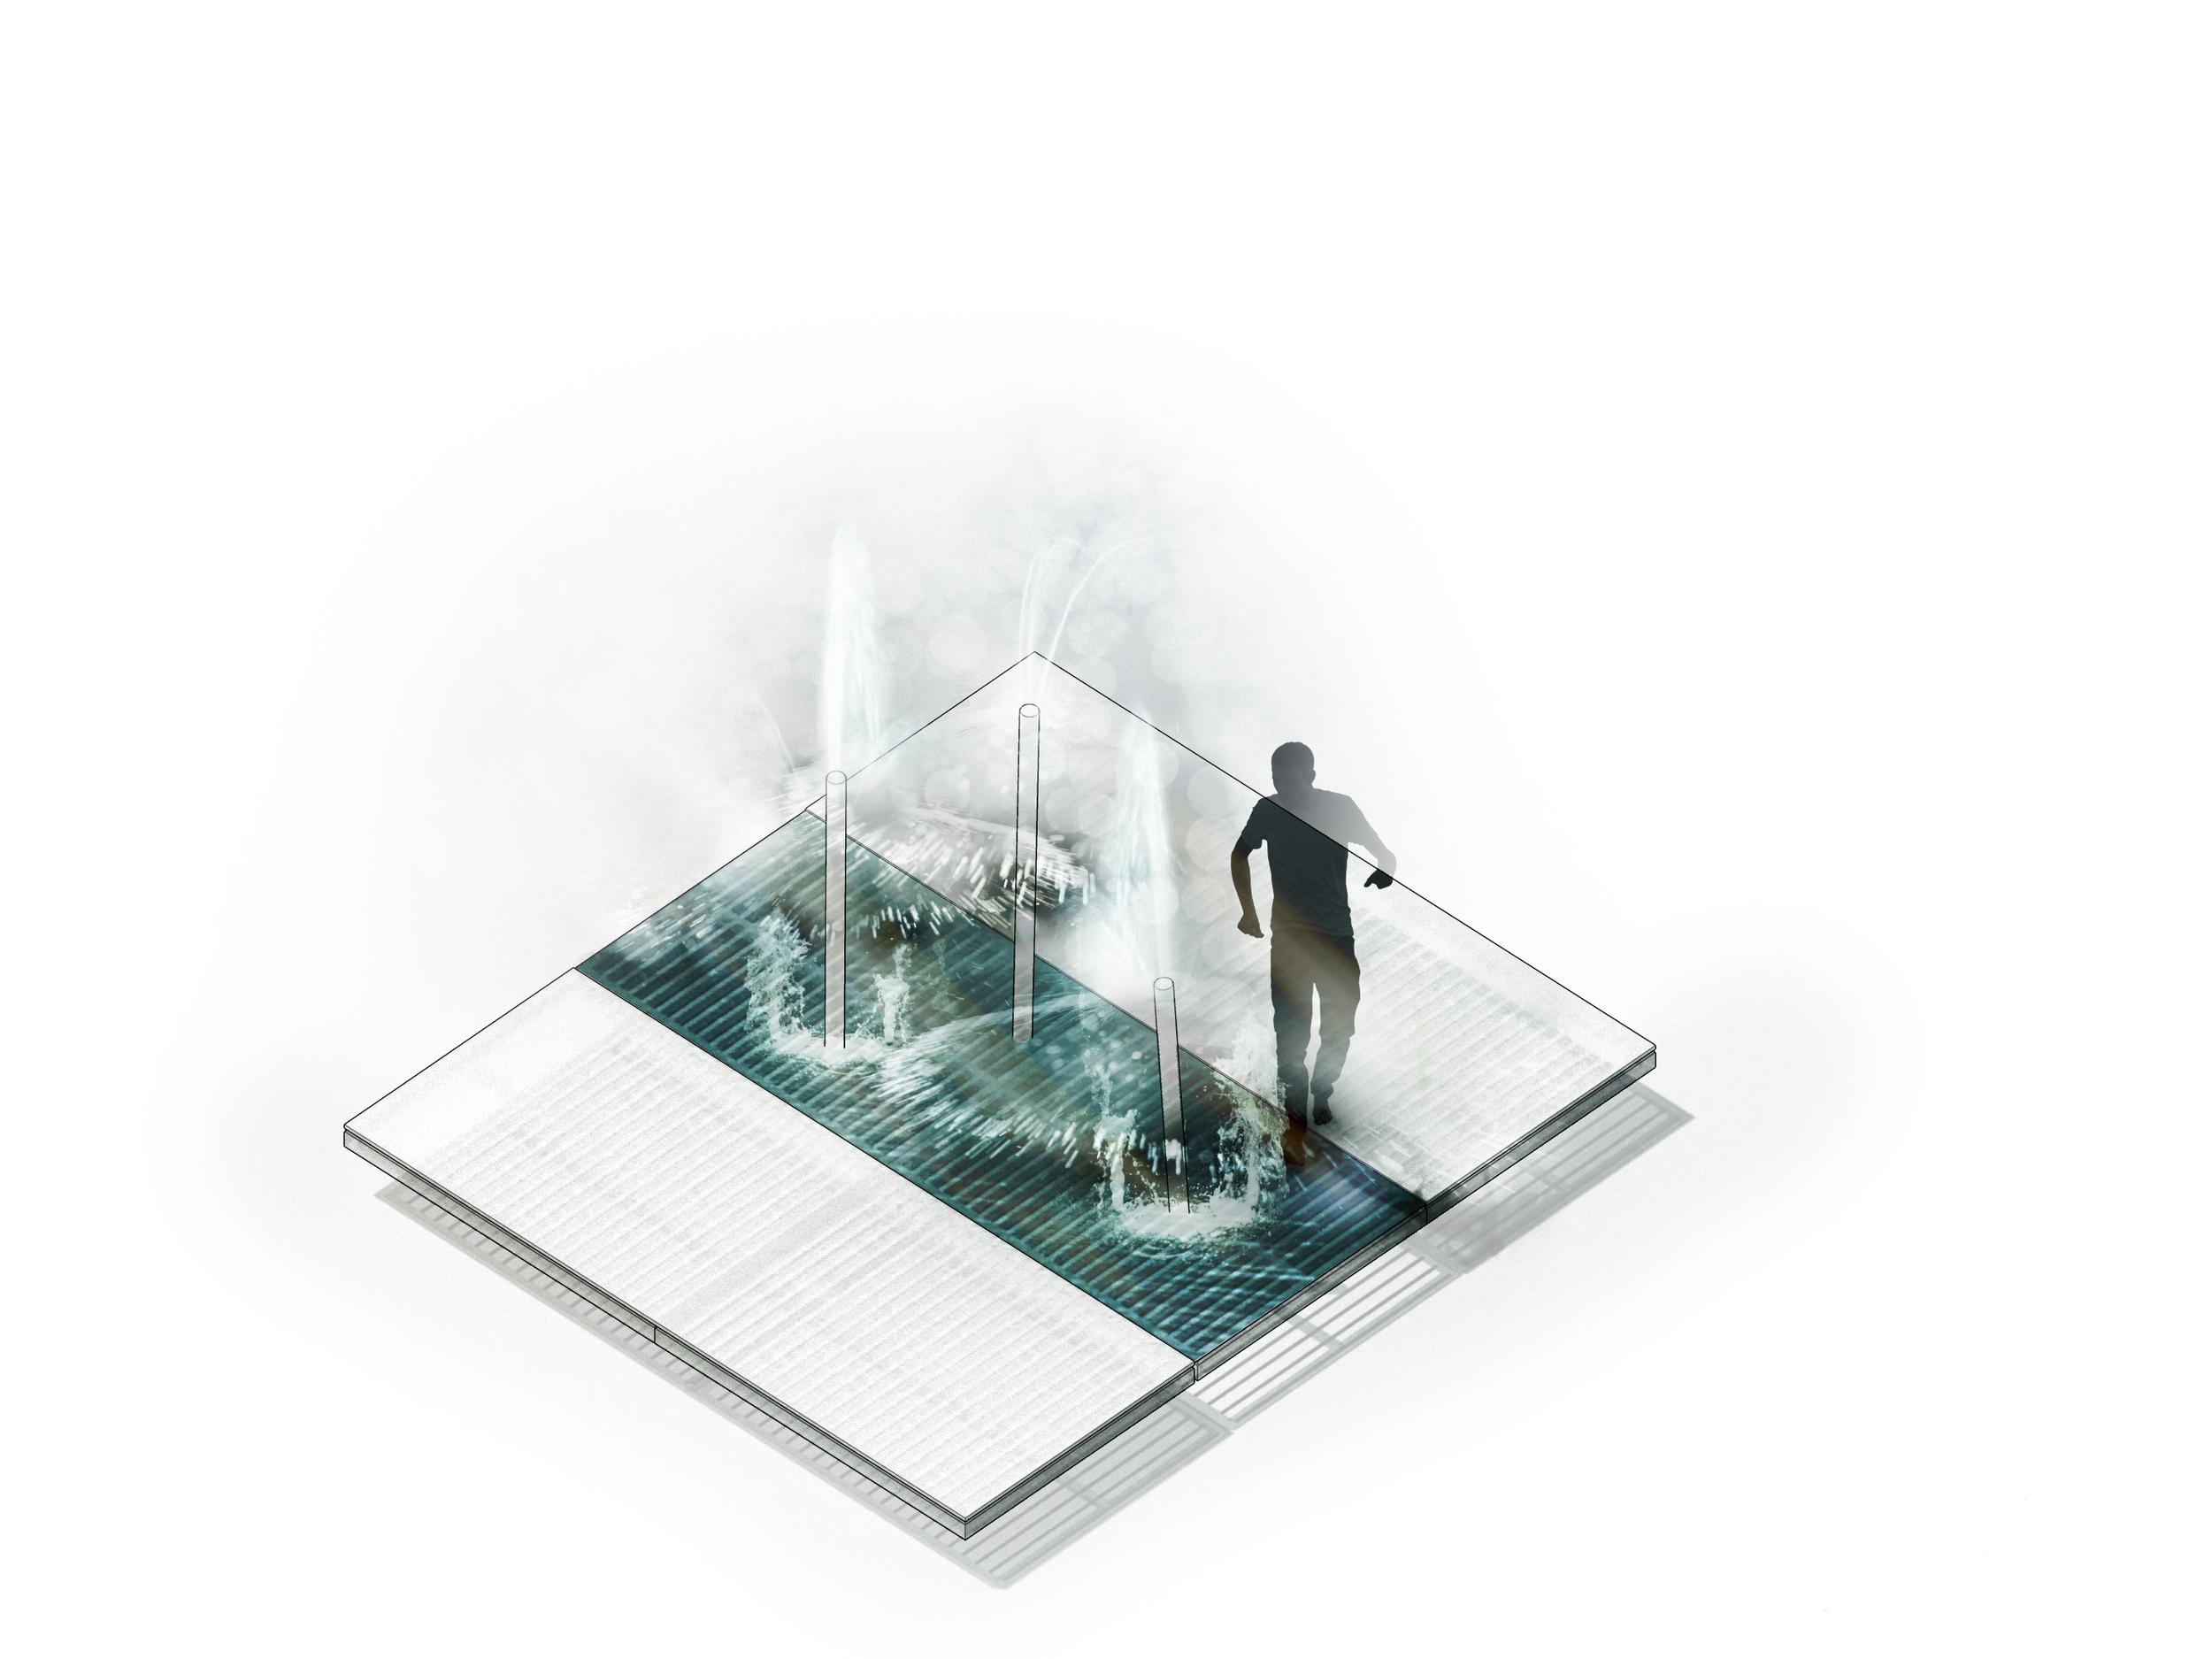 08_water feature.jpg